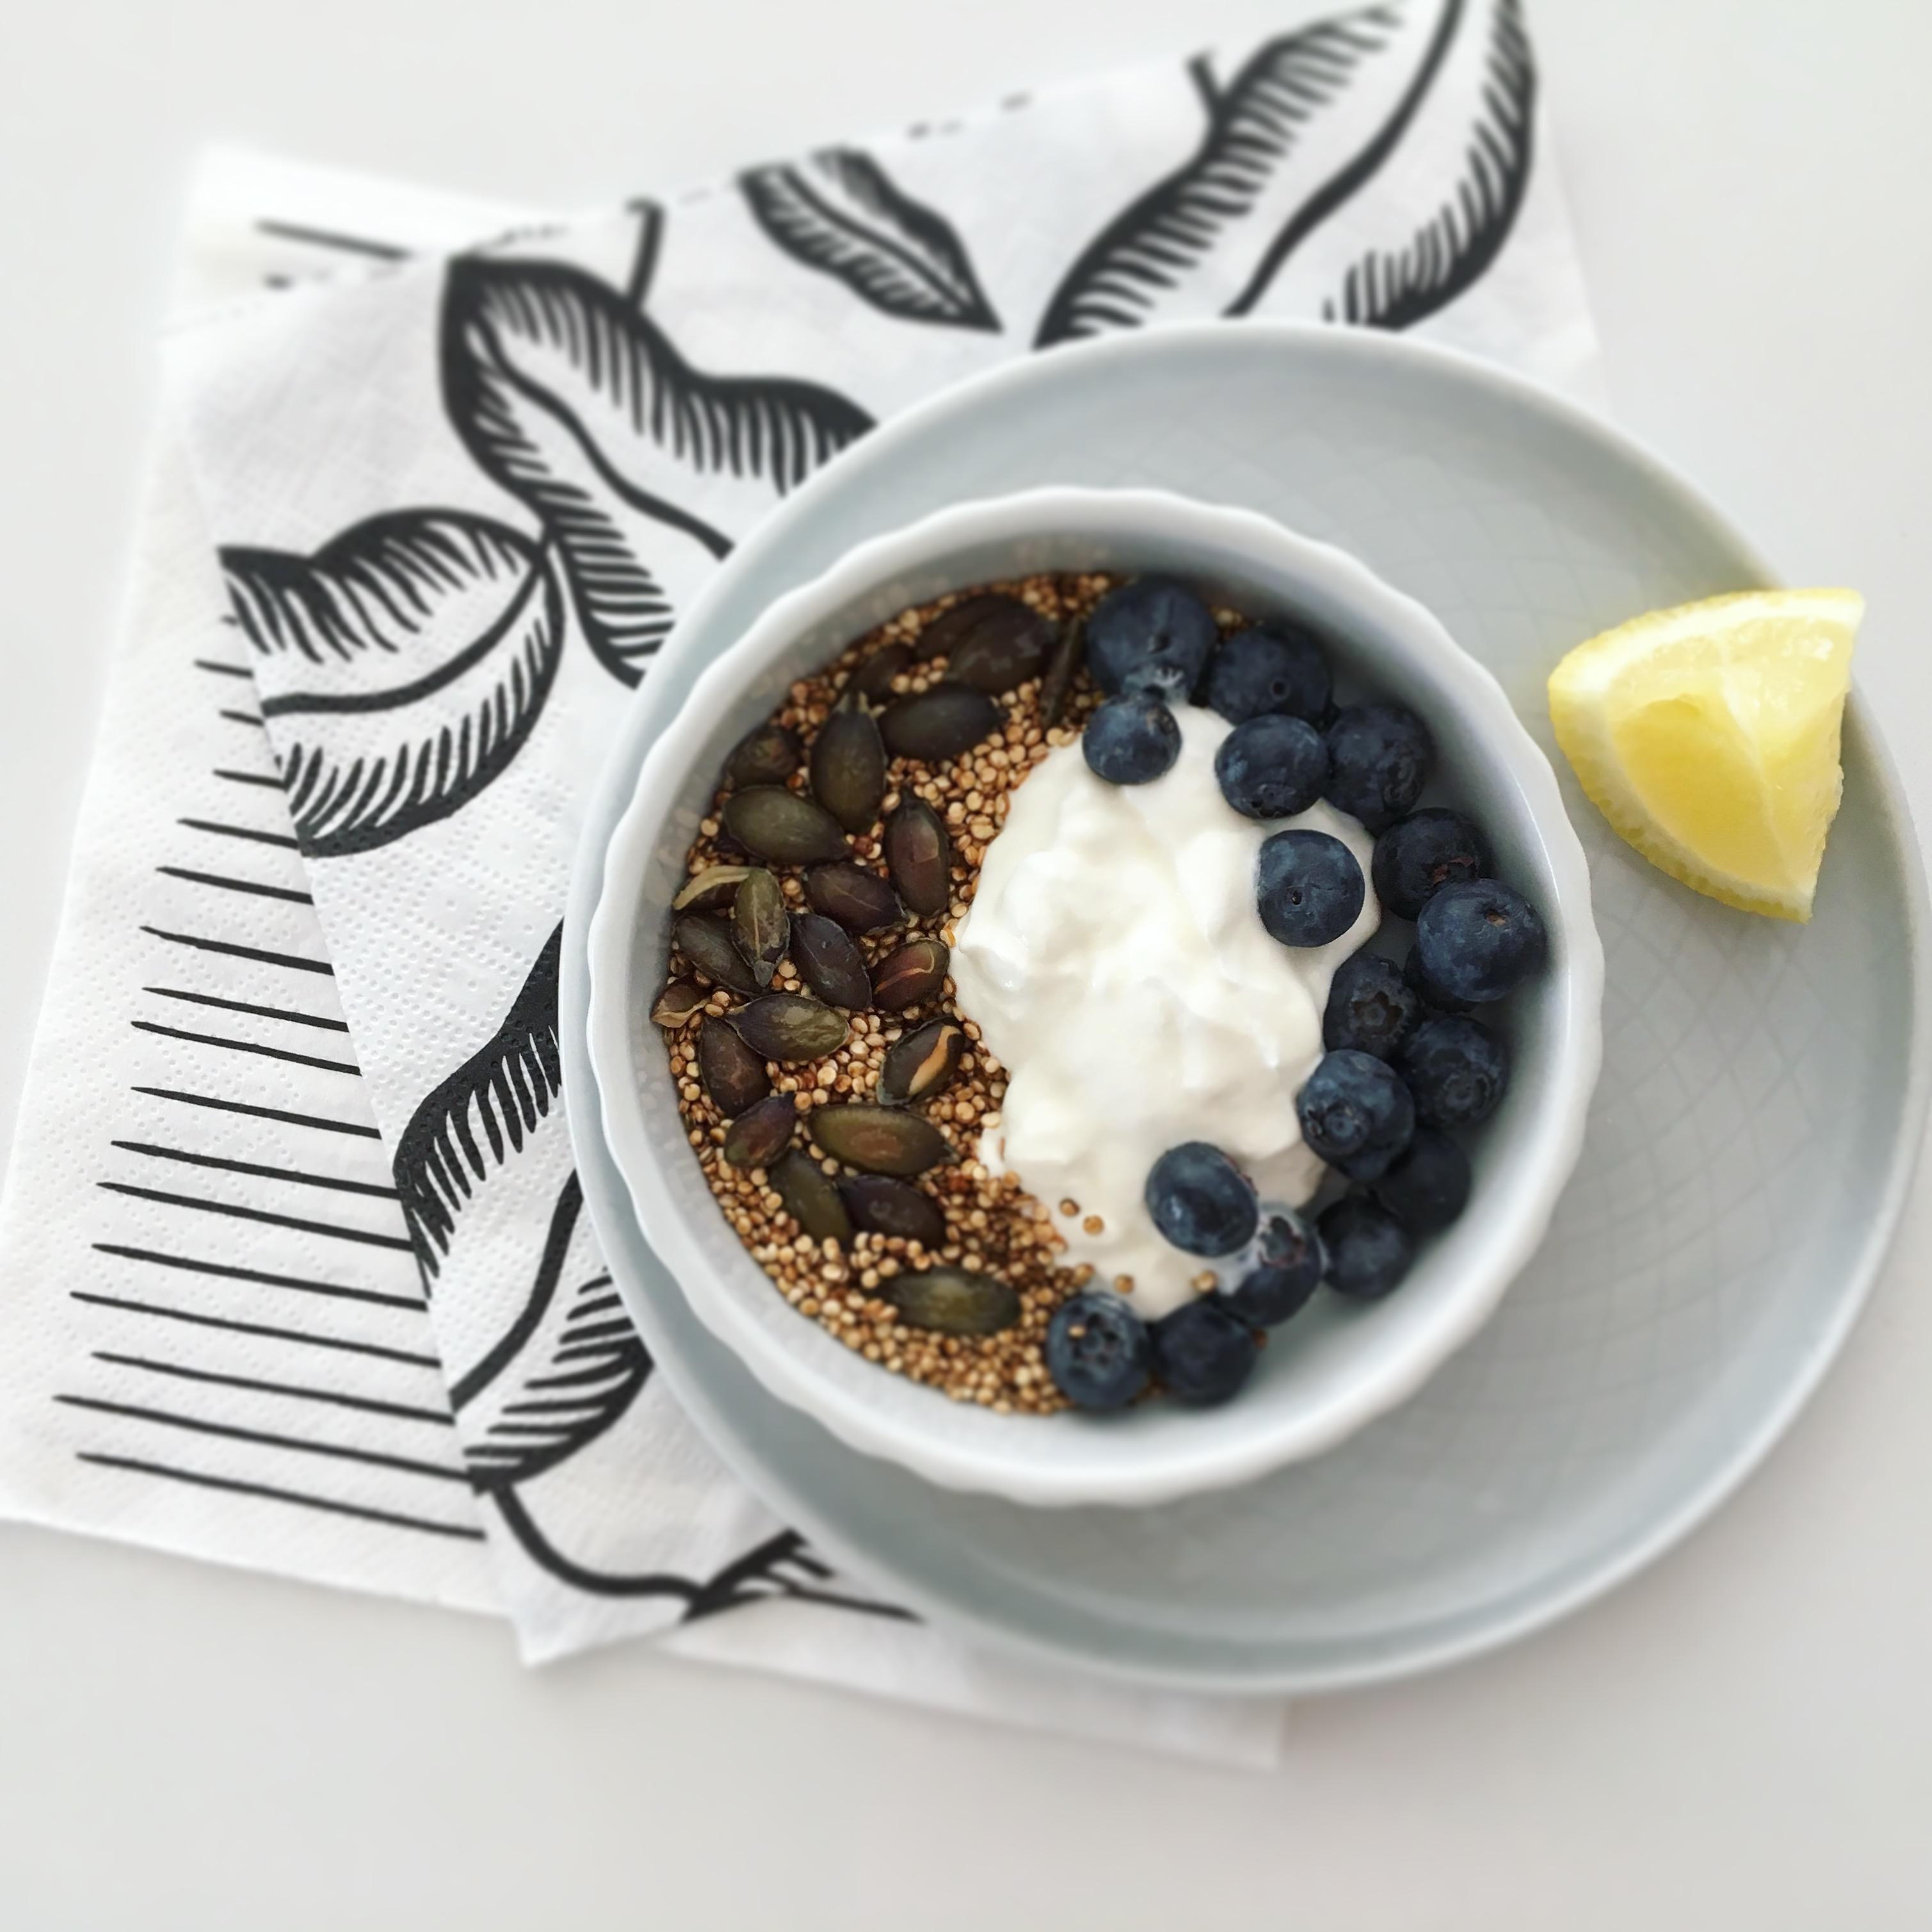 piritott-quinoa-tokmag-reggli-5-hozzavalobol_3.JPG